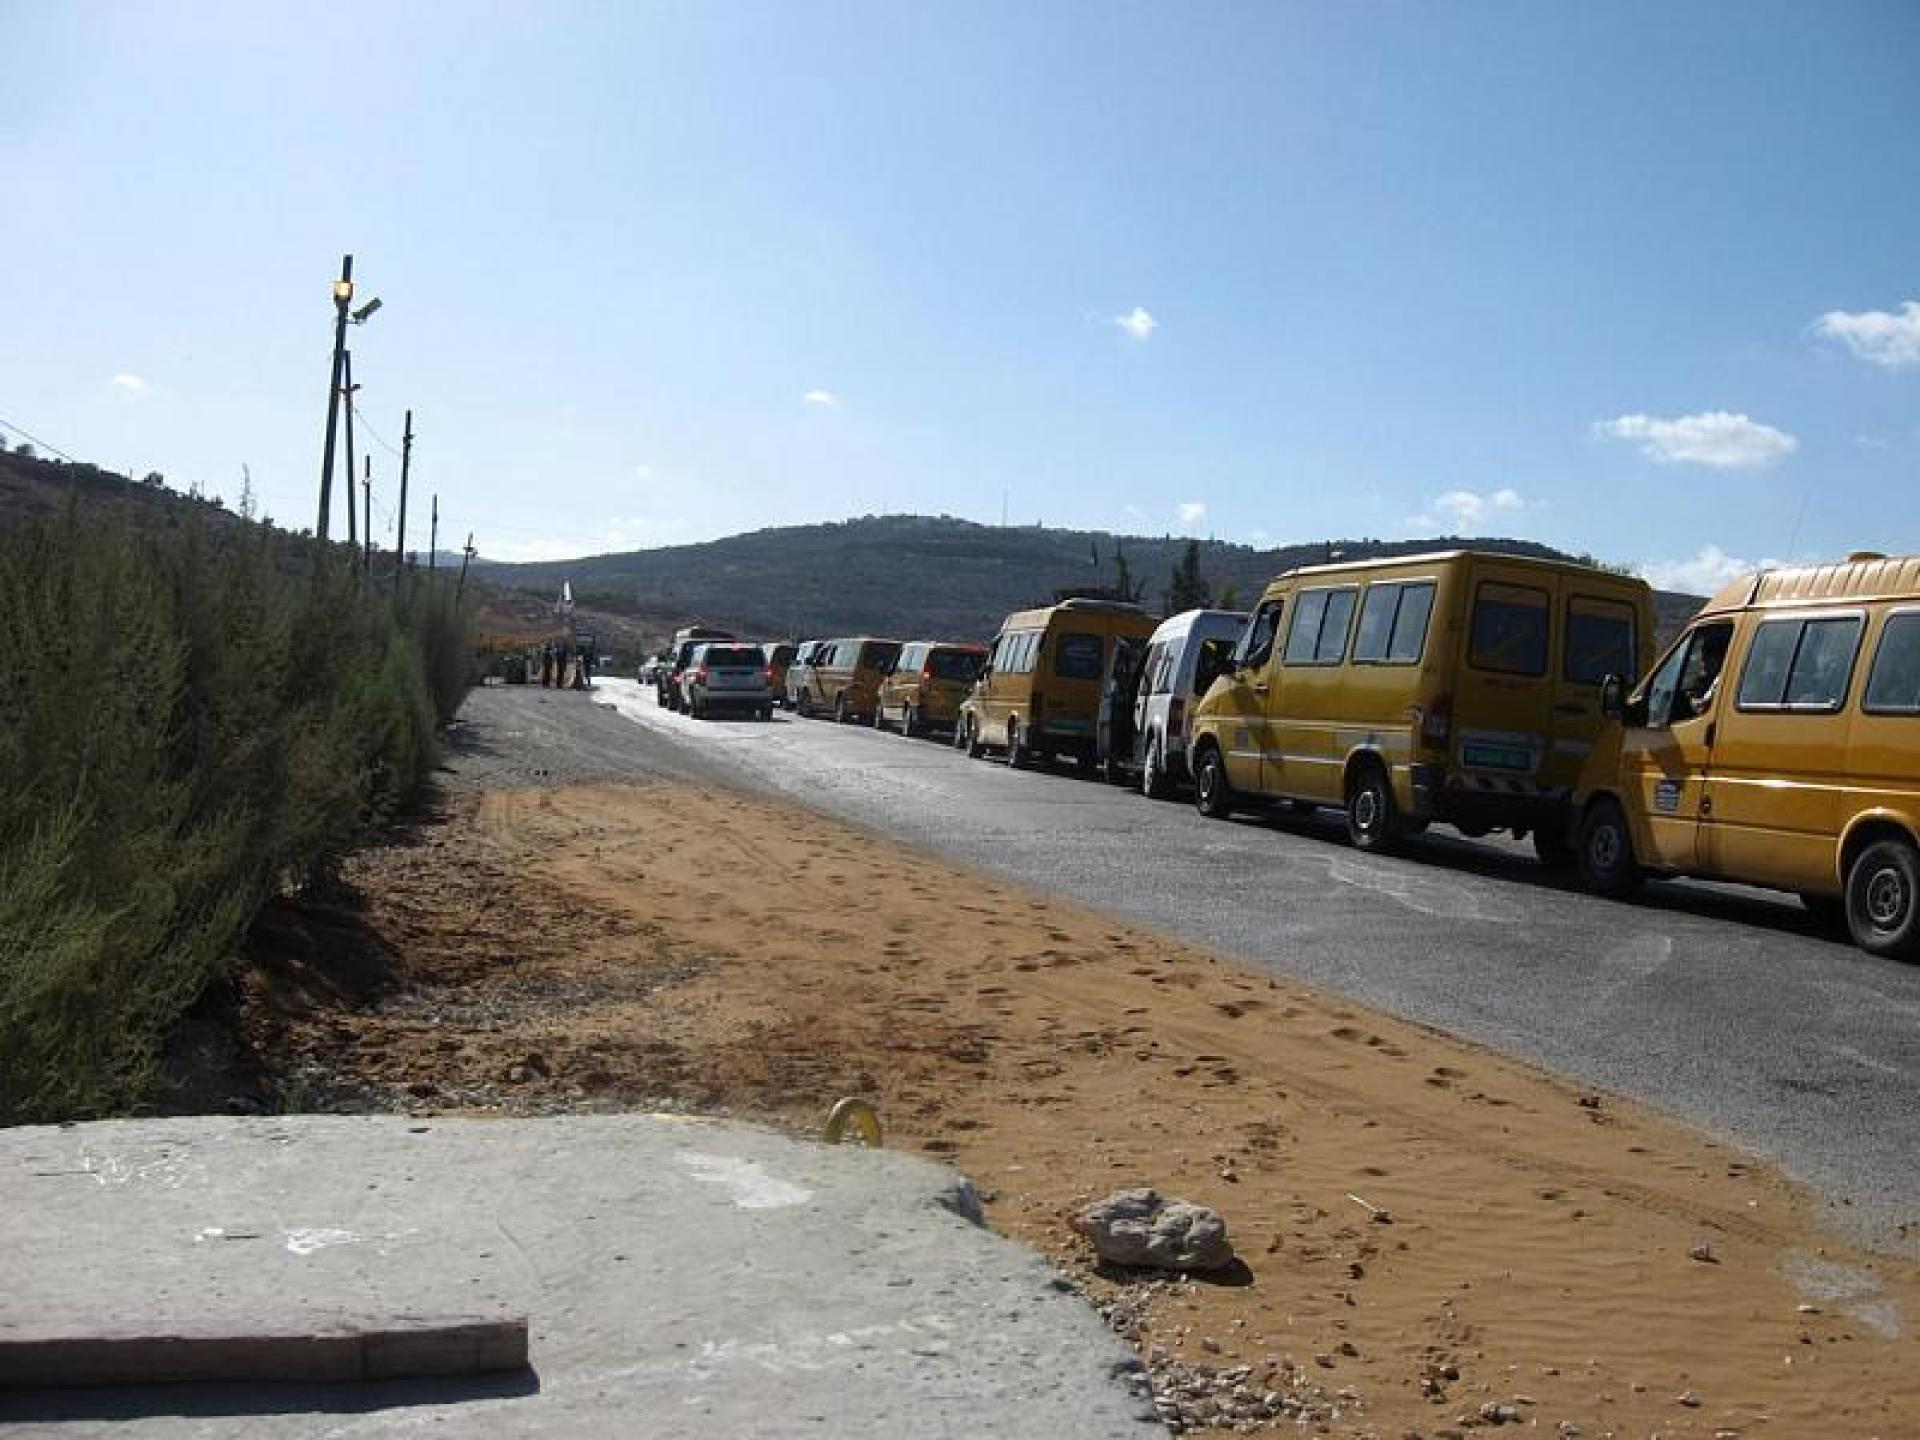 Deir Sharaf/Haviot checkpoint 22.10.09